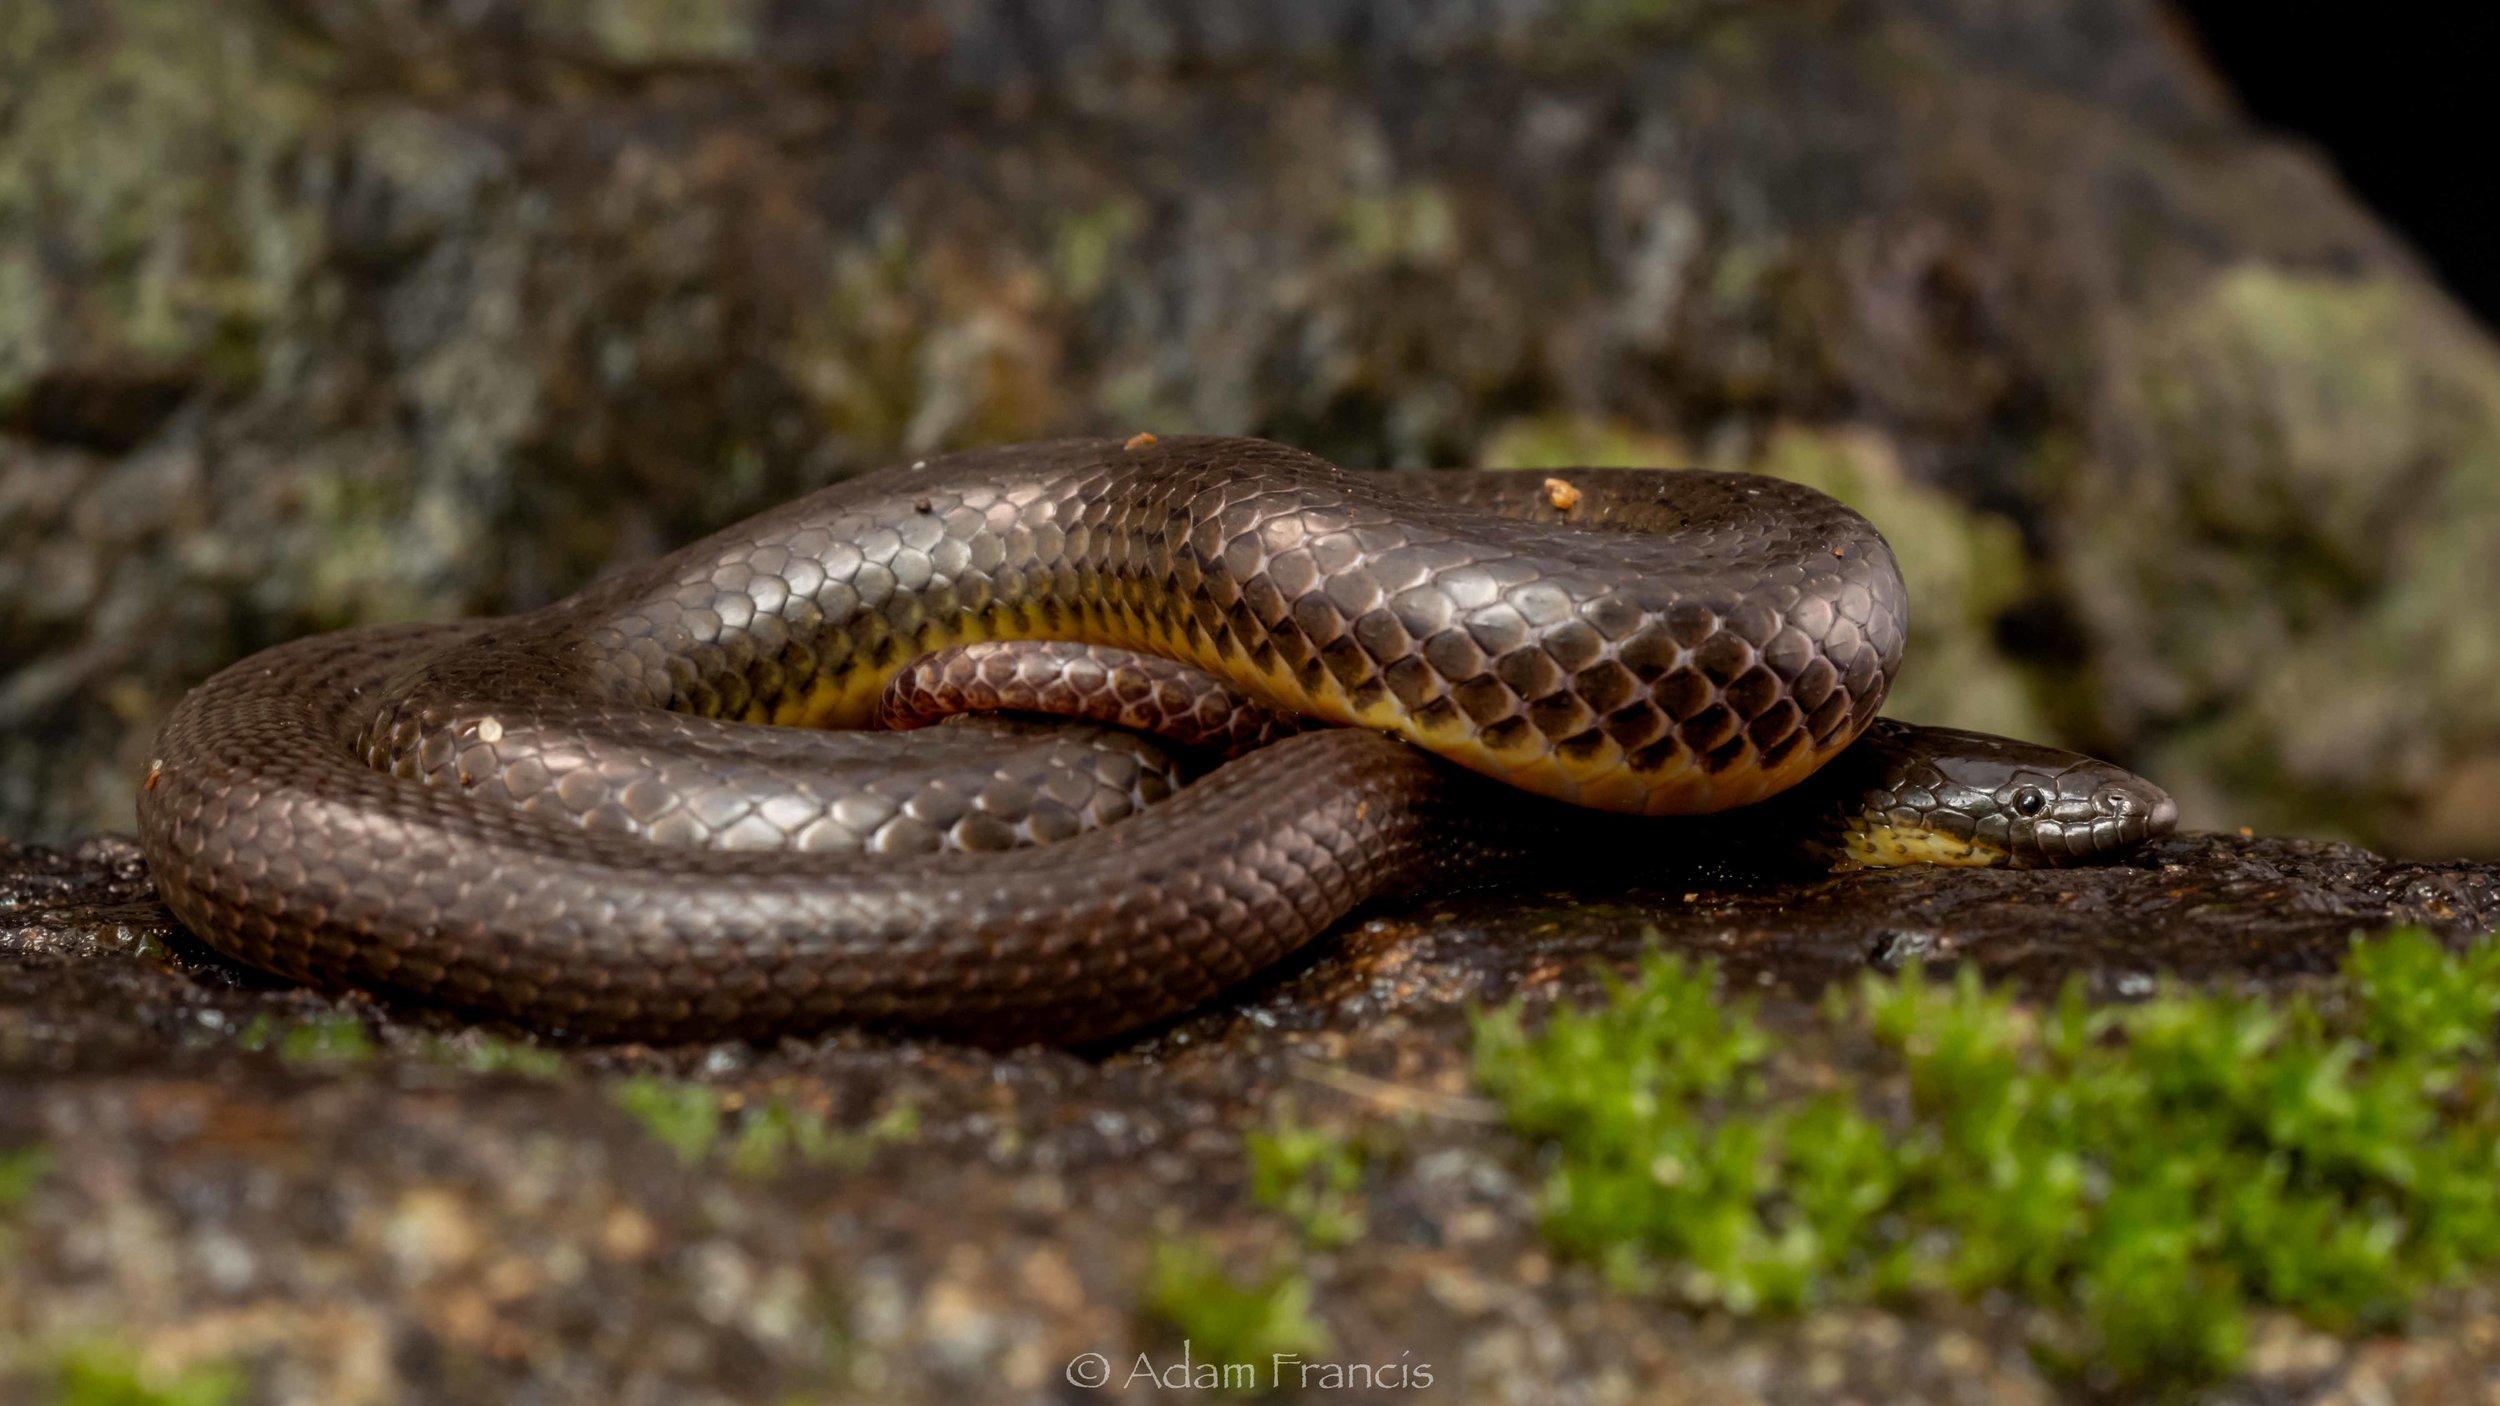 Anderson's Stream Snake - Opisthotropis andersonii